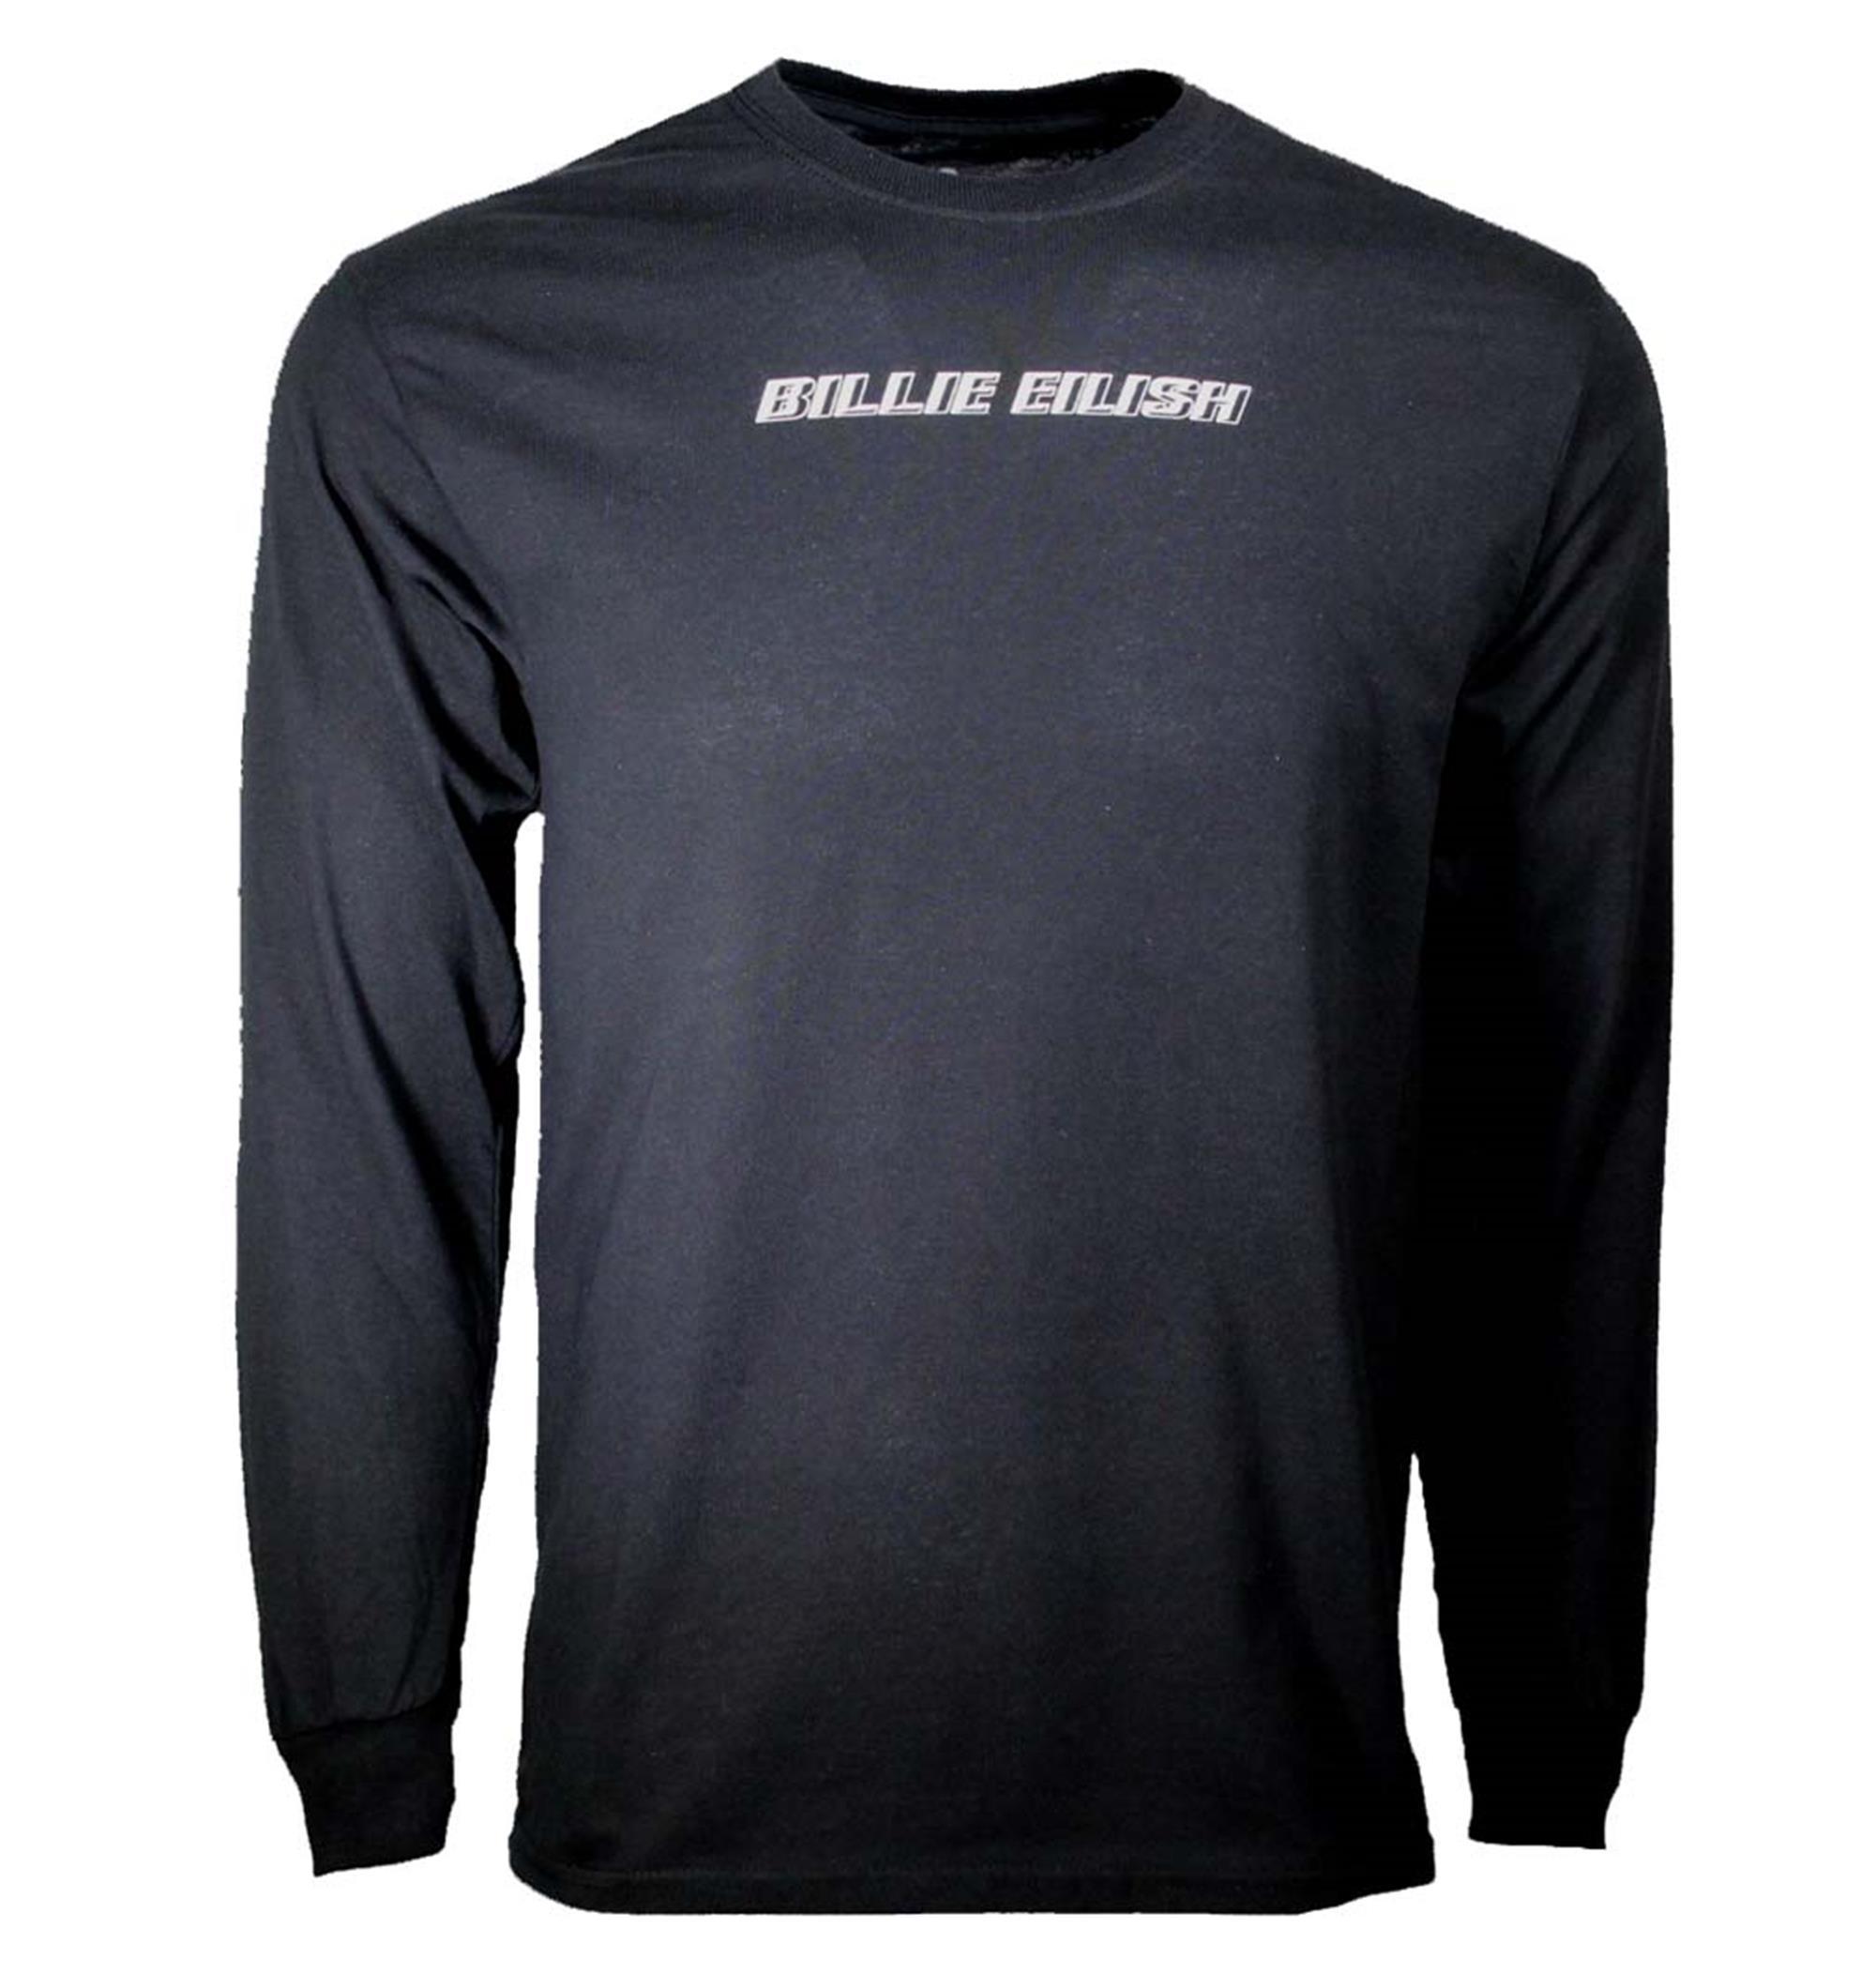 Billie Eilish Black Standard Long Sleeve T-Shirt